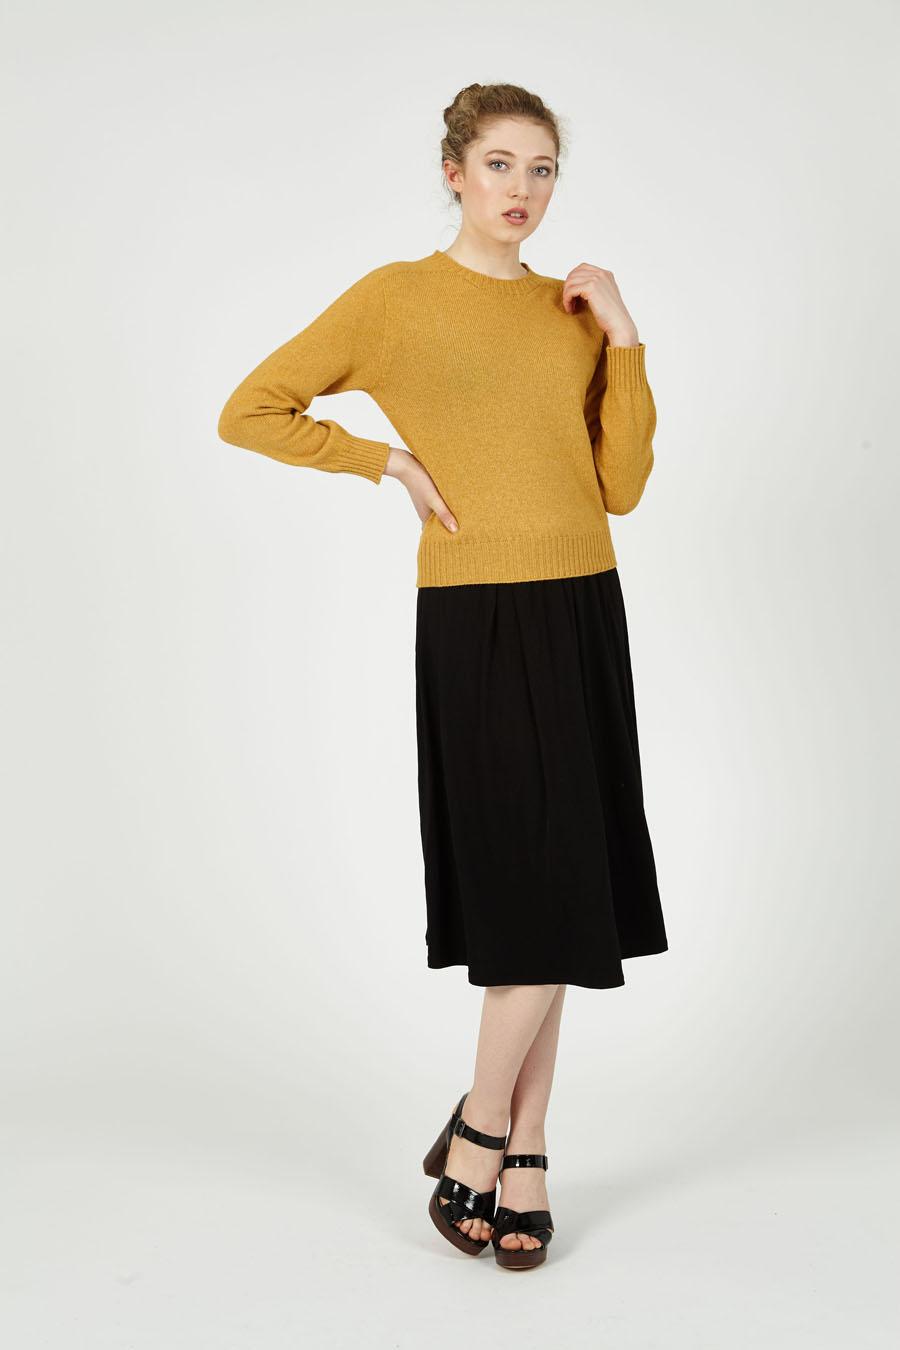 T-lab Alana womens sweater citrus model full